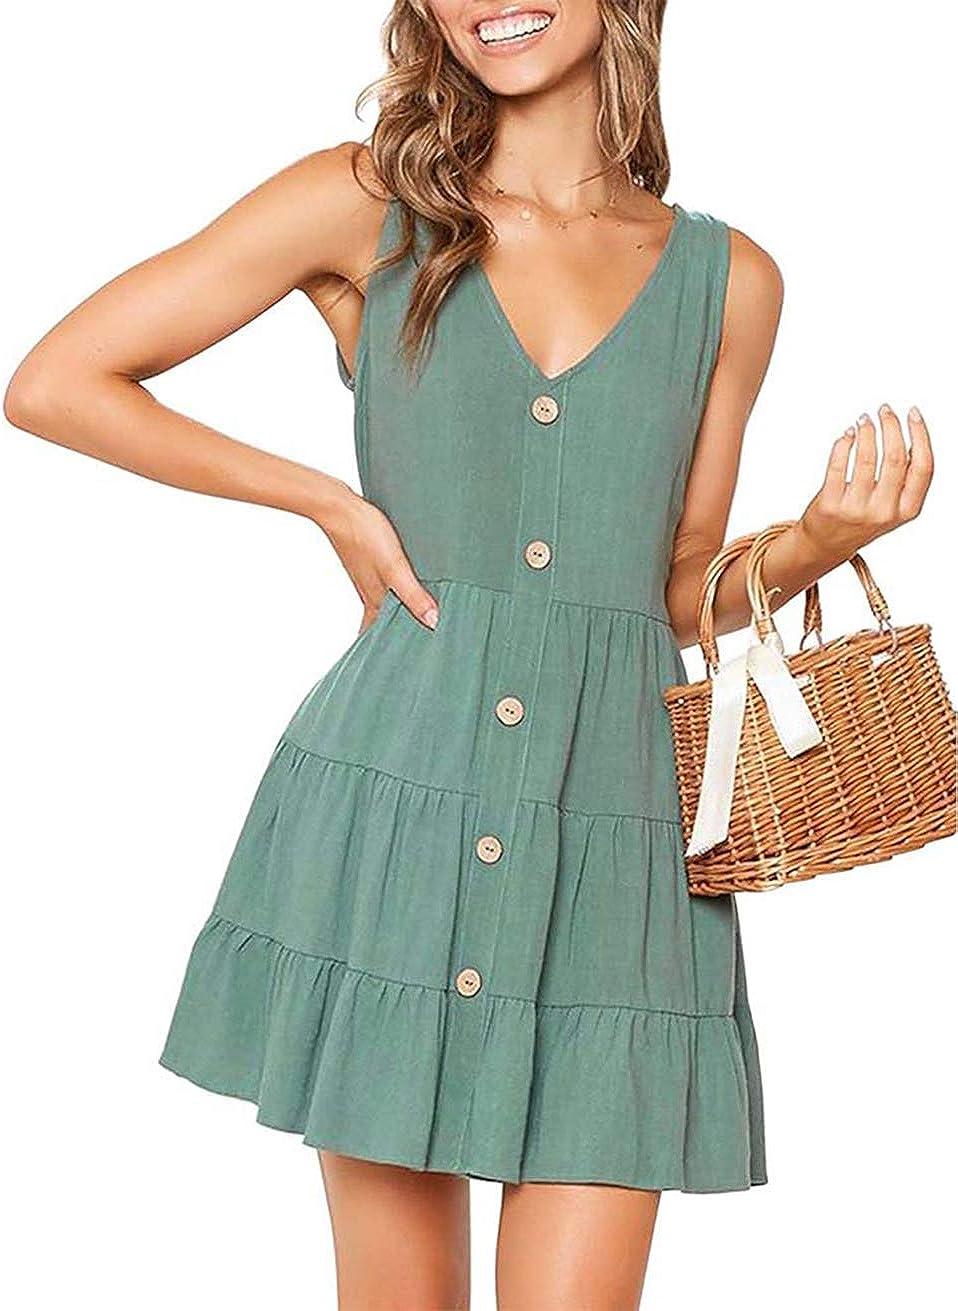 OEUVRE Women V Neck Sleeveless Button Front A Line Short Tank Dress Babydoll Ruffle Mini Dress